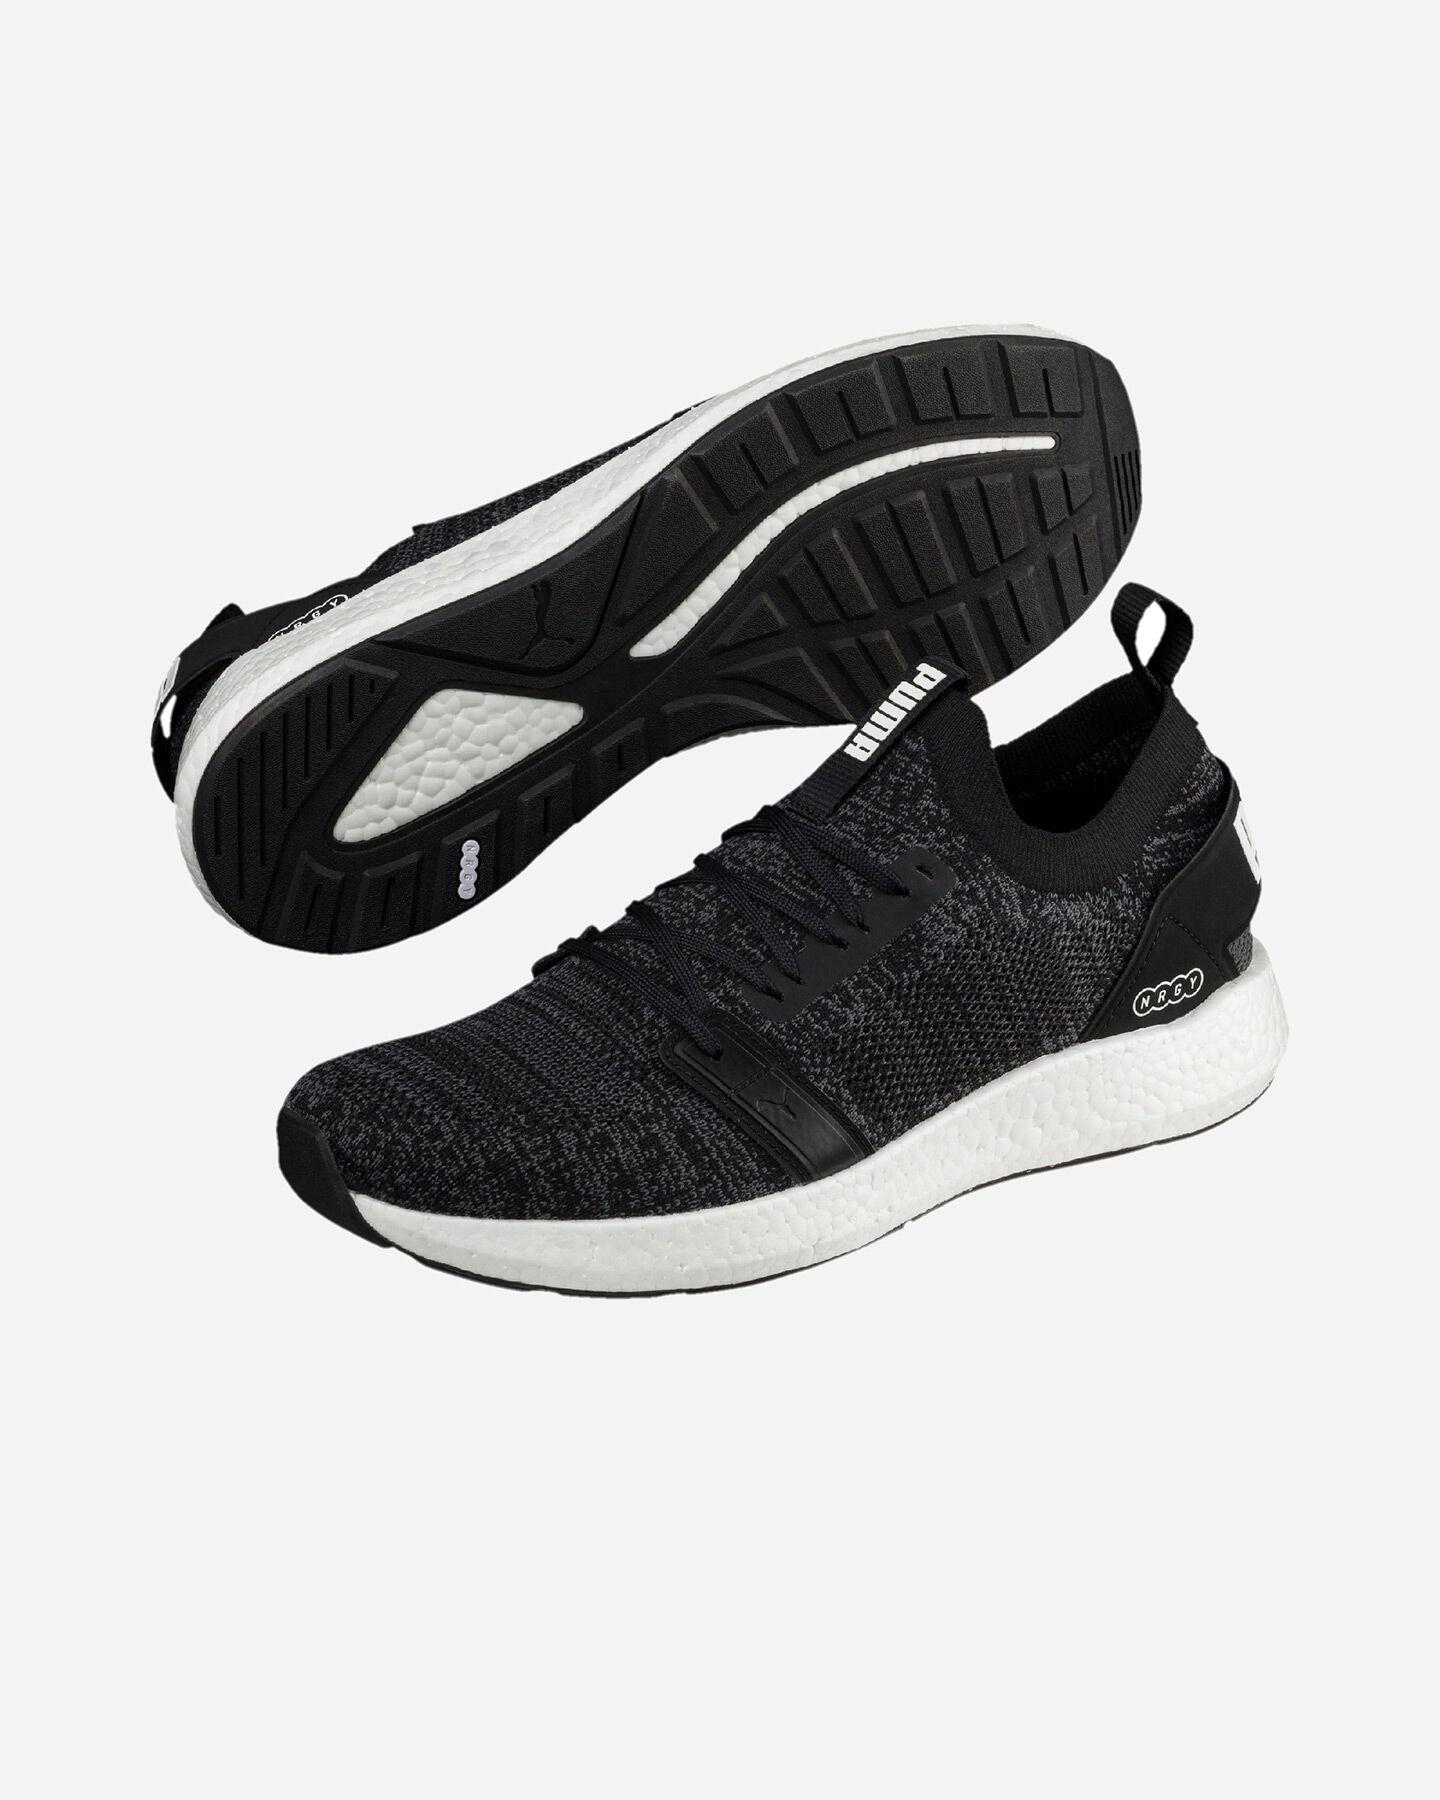 scarpe puma uomo cisalfa sport 71af03 aiagorizia.it